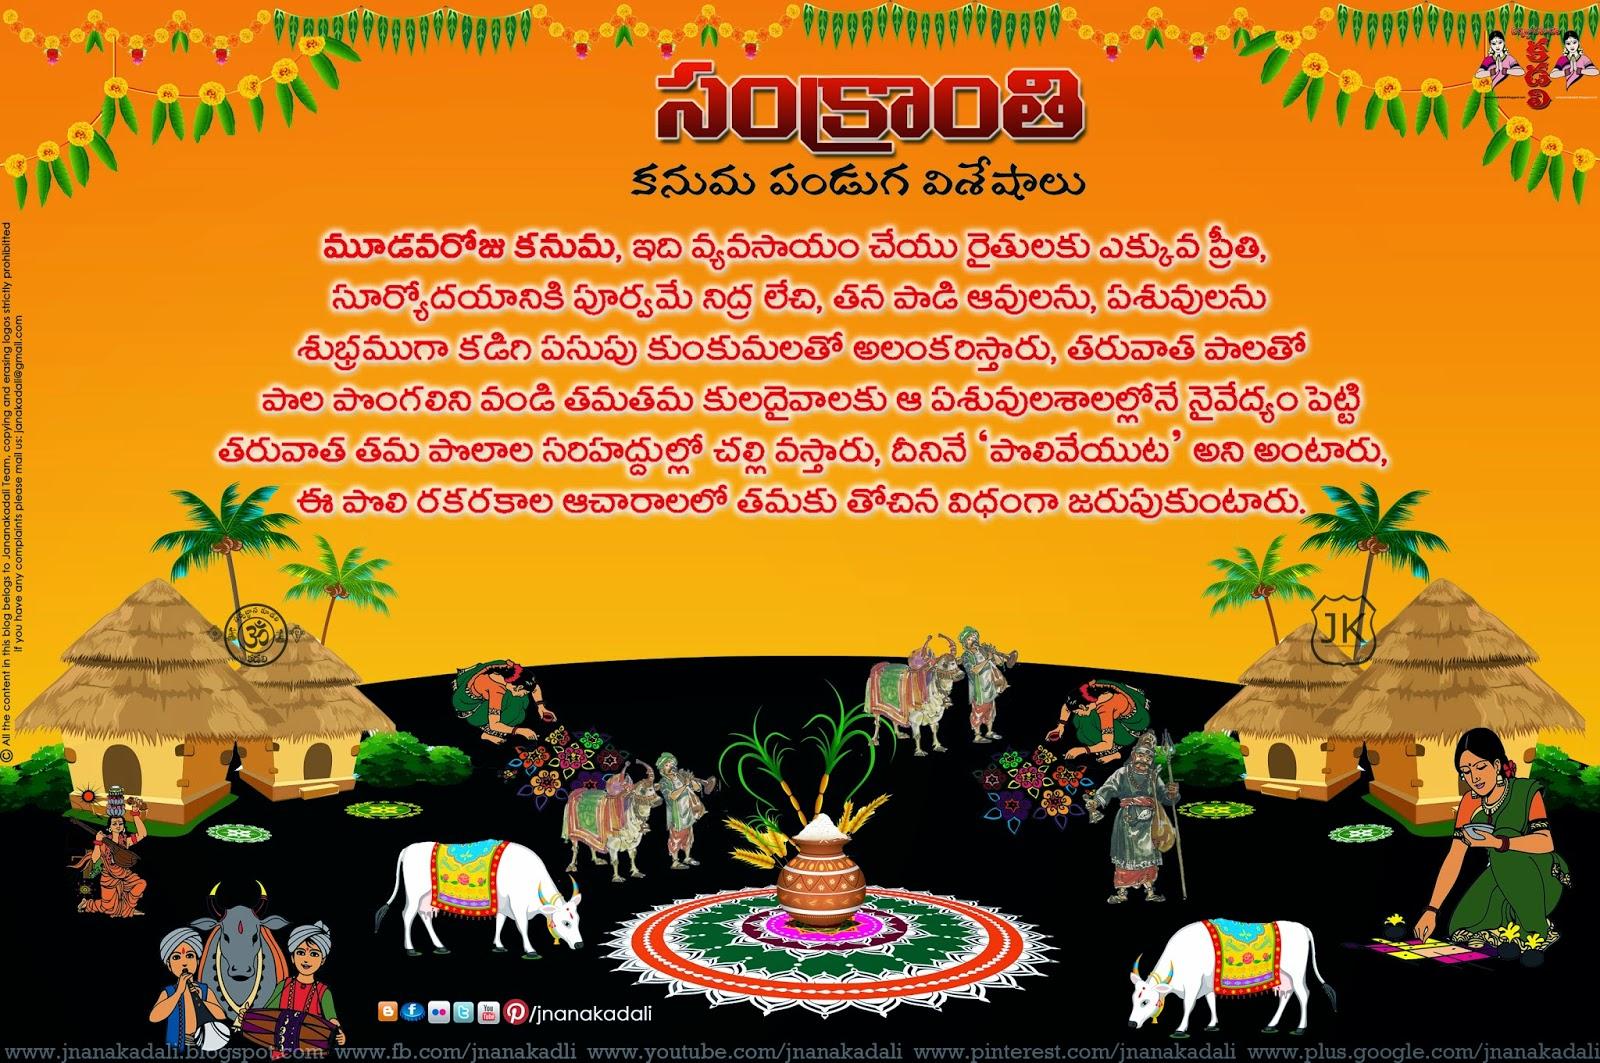 Here is a WhatsApp Pongal Magical Greetings in Telugu Language,Nice Telugu 2015 Sankranti Greetings for WhatsApp. Nice WhatsApp Quotes and Greetings for WhatsApp. Beautiful WhatsApp Pongal Quotes and Greetings in Telugu Language. Pongal Magical Images,Happy Sankranti Telugu WhatsApp Magic Greetings.Telugu Sankranti Quotations and Greetings wishes.Here is a Nice Sankranti Telugu Quotations with Nice Images. Makara Sankranti Telugu Quotes Images. Quotes about Pongal in Telugu Language. Telugu Pongal Quotes Pictures. awesome Telugu Quotations and Telugu Quotations Images. Nice Telugu Quotes Telugu Sankranti Festival Greeting Cards.Telugu 2015 Pongal wishes and Greetings with Quotes in Telugu Language. Telugu Latest 2015 Pongal Messages and Quotations. pongal Telugu Quotations. Sankranthi Telugu Quotes Images. Pongal Telugu Quotes Online. Nice Telugu Pongal Quotes Pictures.Happy Bhogi and Pongal Telugu Quotes and Greetings,Nice Bhogi Telugu Quotations and Pongal Greetings 2015. Cool 2015 Bhogi Quotes Images. Bhogi Quotations Images. Bhogi Telugu Pictures Messages. 2015 Sankranthi Bhogi Images. Happy Bhogi Telugu Quotes Images. Nice Bhogi Festival Celebrations and Quotations Images. Happy Bhogi 2015 Images,Telugu Sankranthi HD Quotes Wallpapers,Sankranthi Telugu Images, Pongal Quotes in Telugu With Pot, Telugu Sankranthi Greetings Free, Telugu Sankranthi  Quotations, Telugu Sankranthi Receps, Telugu Sankranthi HD Wallpapers, Pongal HD Background Wallpapers,Telugu Pongal HD wallpapers, Telugu Pongal Greetings in Telugu Font, Telugu Pongal Images, Telugu Pongal SMS,Kanuma Greetings in Telugu | Telugu Kanuma Festival Quotes,Bhogi Quotes in Telugu | Bhogi Telugu Wallpapers,Bhogi Greetings in Telugu, Telugu Bhogi Festival Date Quotes, Telugu Bhogi Festival Quotes images, Telugu Pongal Bhogi Images, Telugu bhogi Messages, Telugu Bhogi SMS, Telugu Bhogi Images,Telugu Festival wishes greetings for Pongal Sankranthi Kanuma greetings hd images and nice wall papers in telugu,Bhogi 